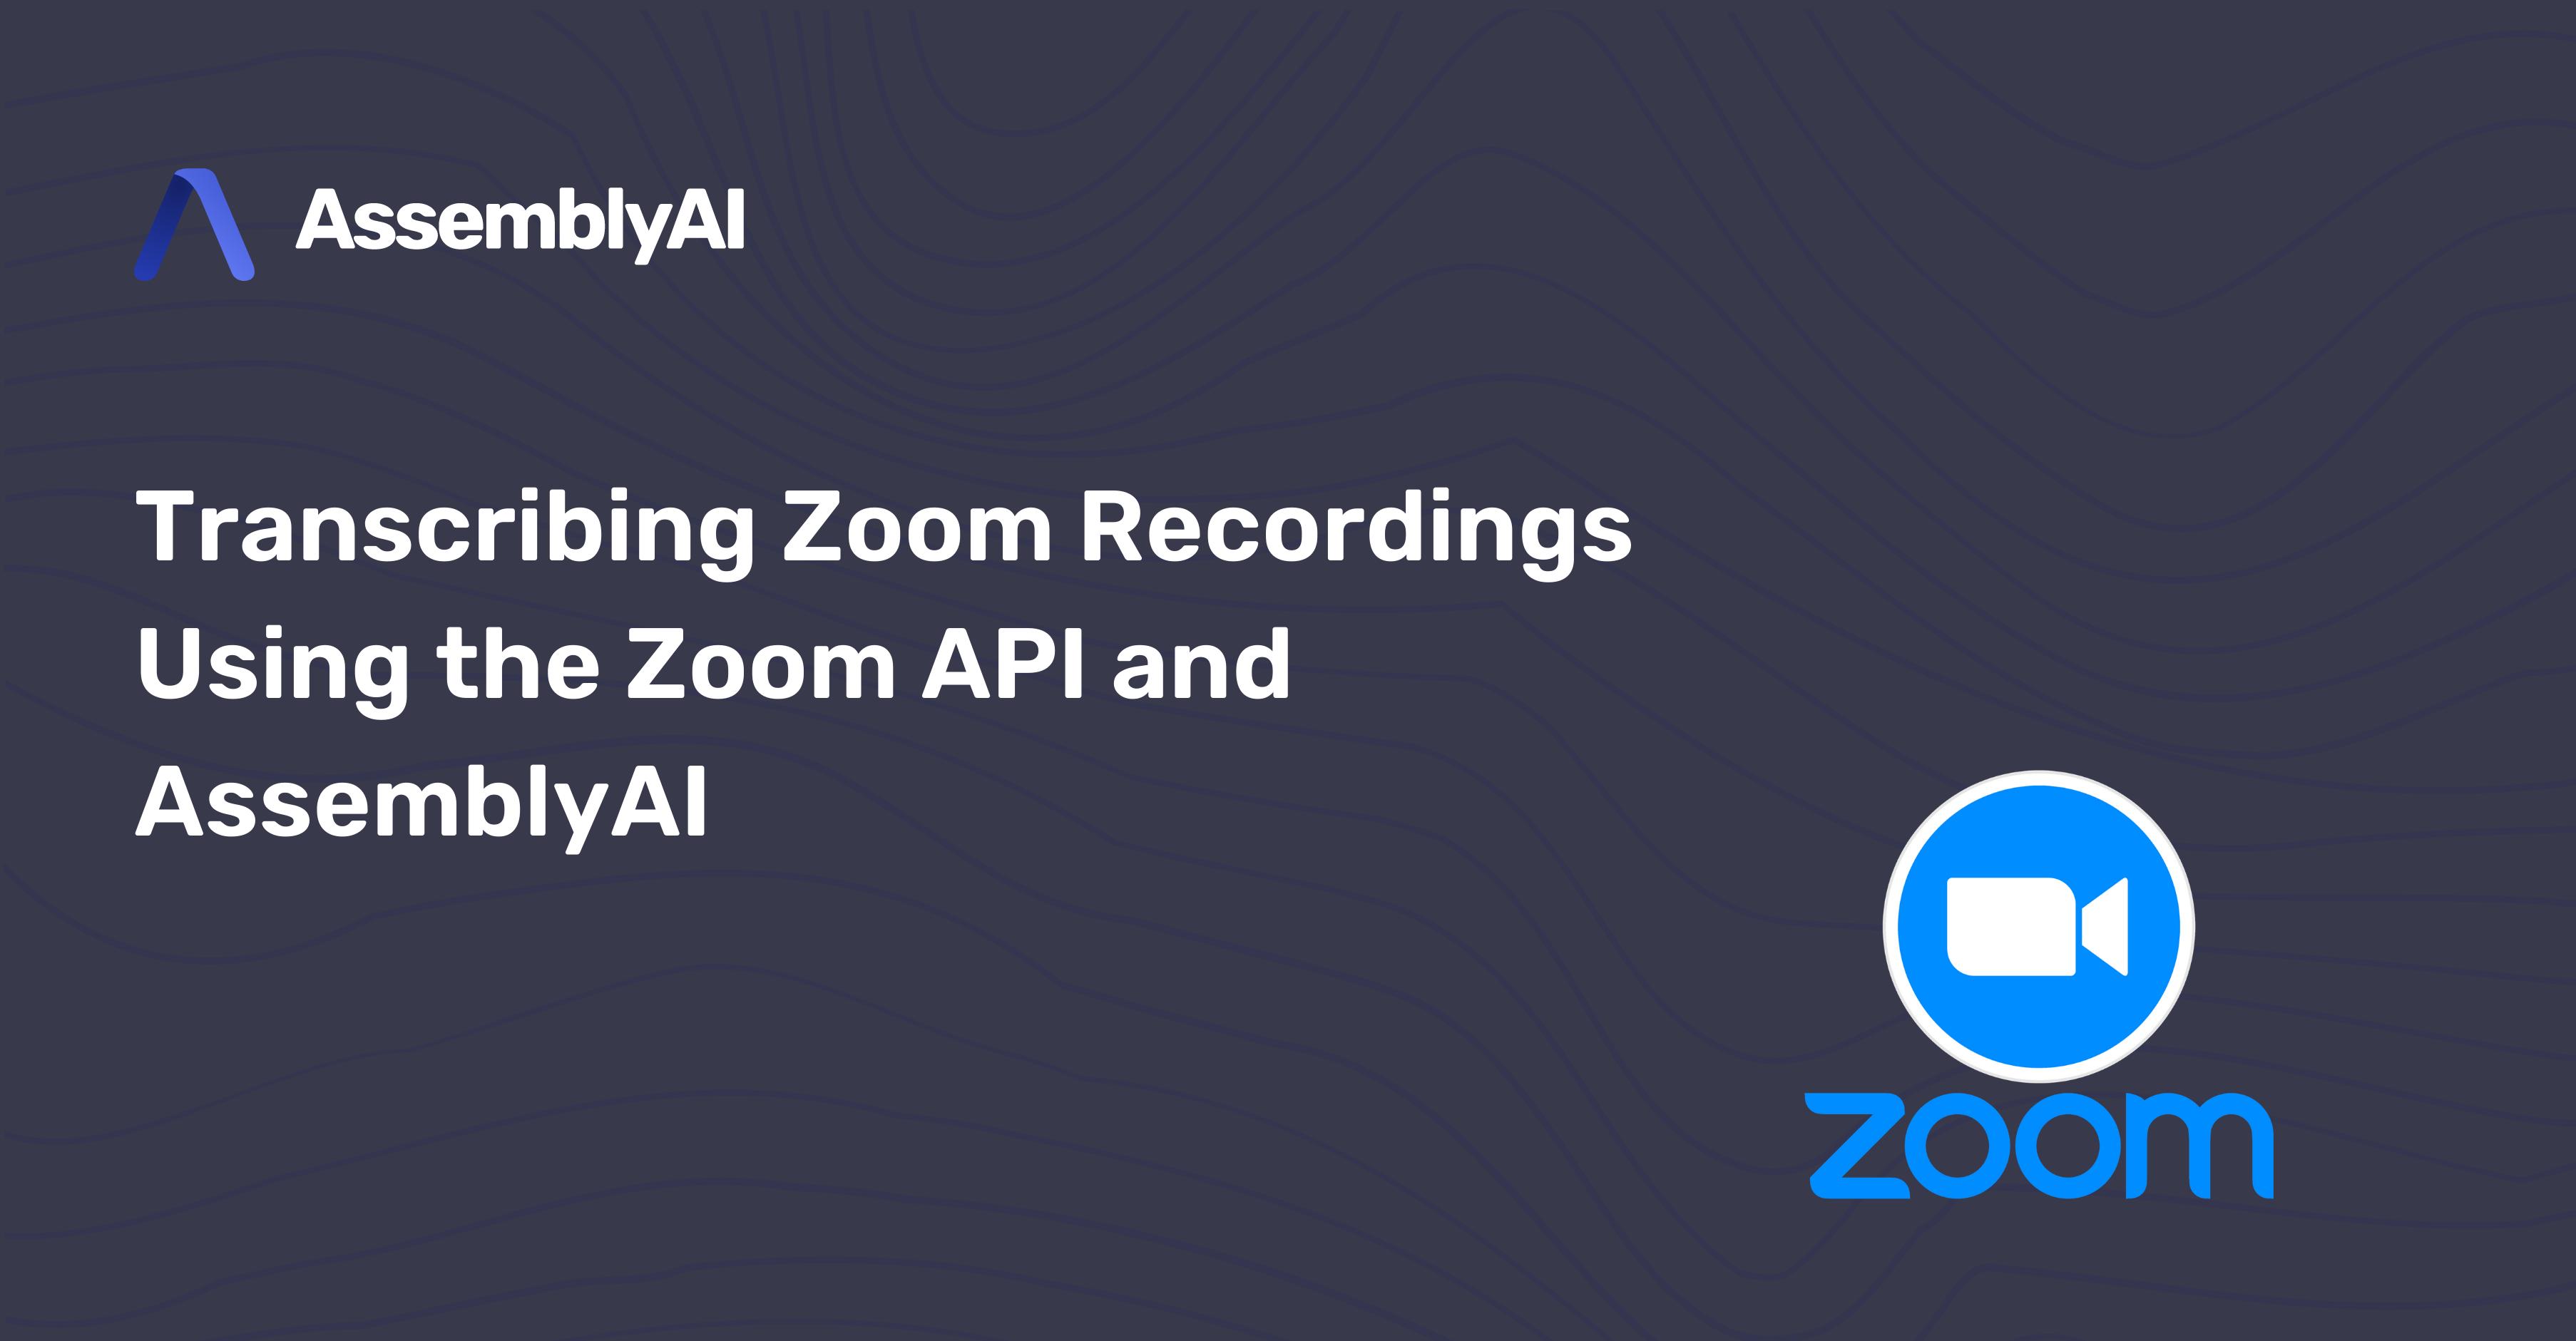 Transcribing Zoom Recordings Using the Zoom API and AssemblyAI